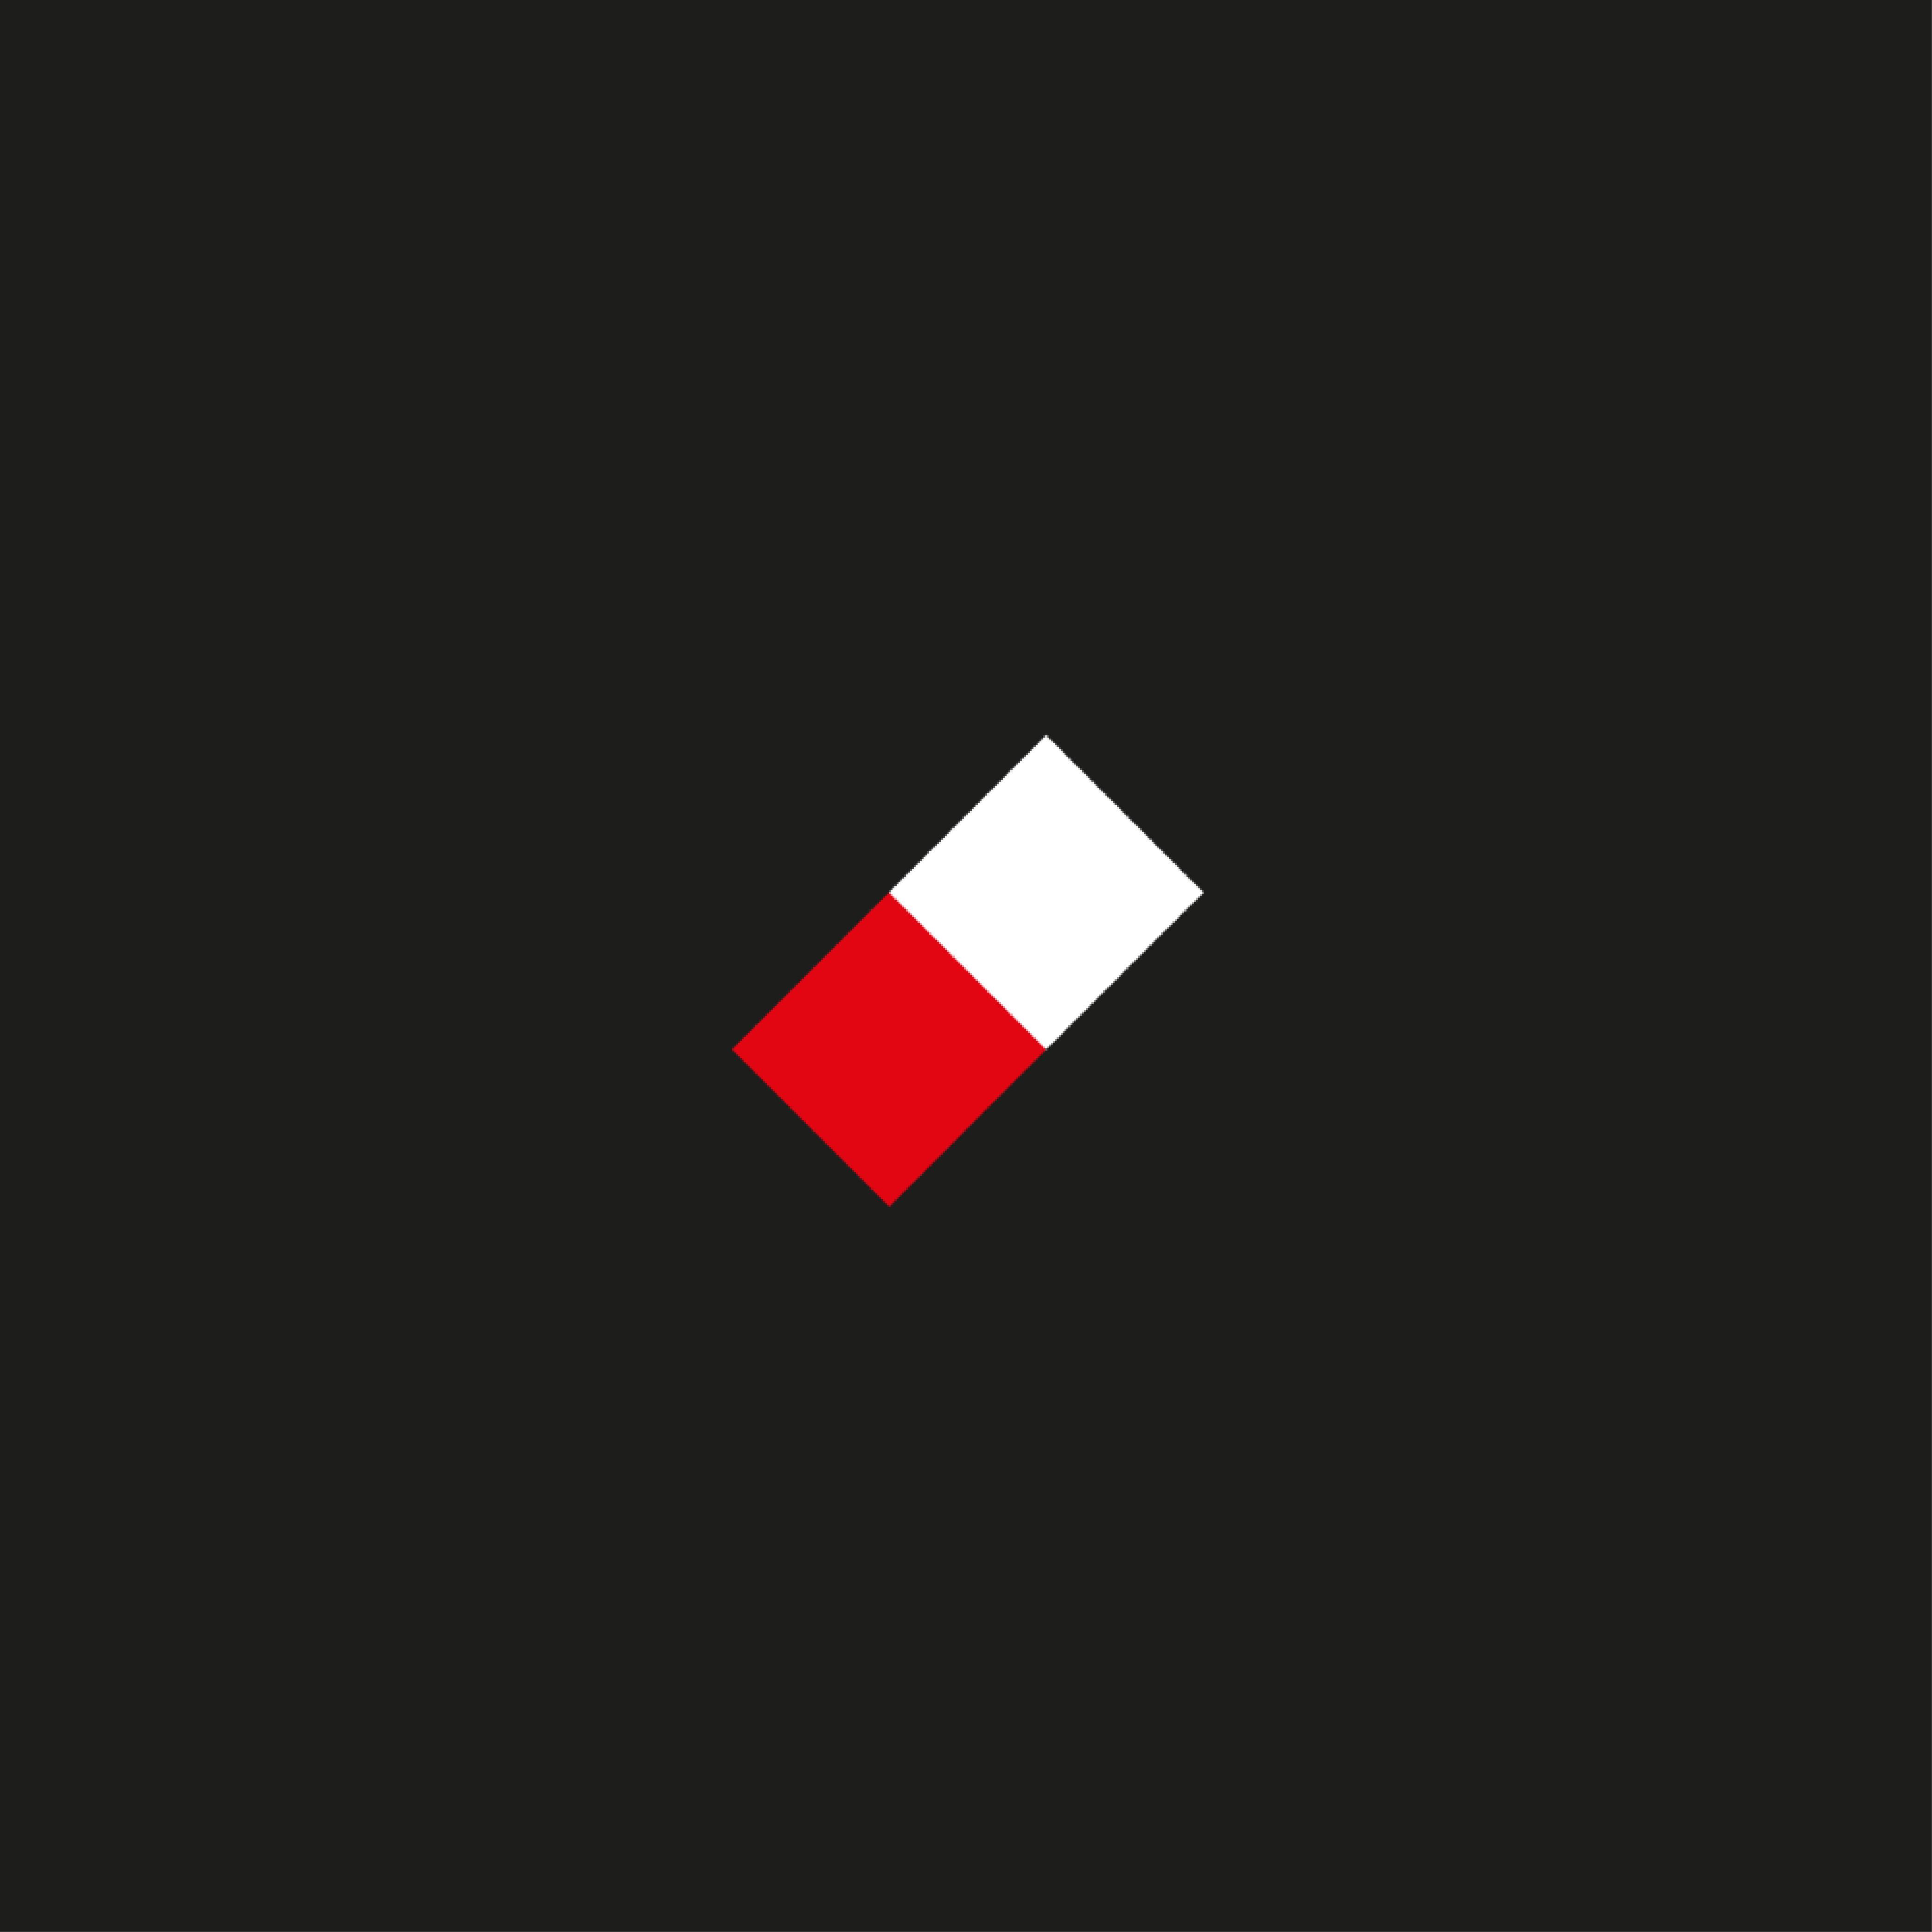 Témoignage Graphéine - Degrange Quentin Webdesigner Cannes